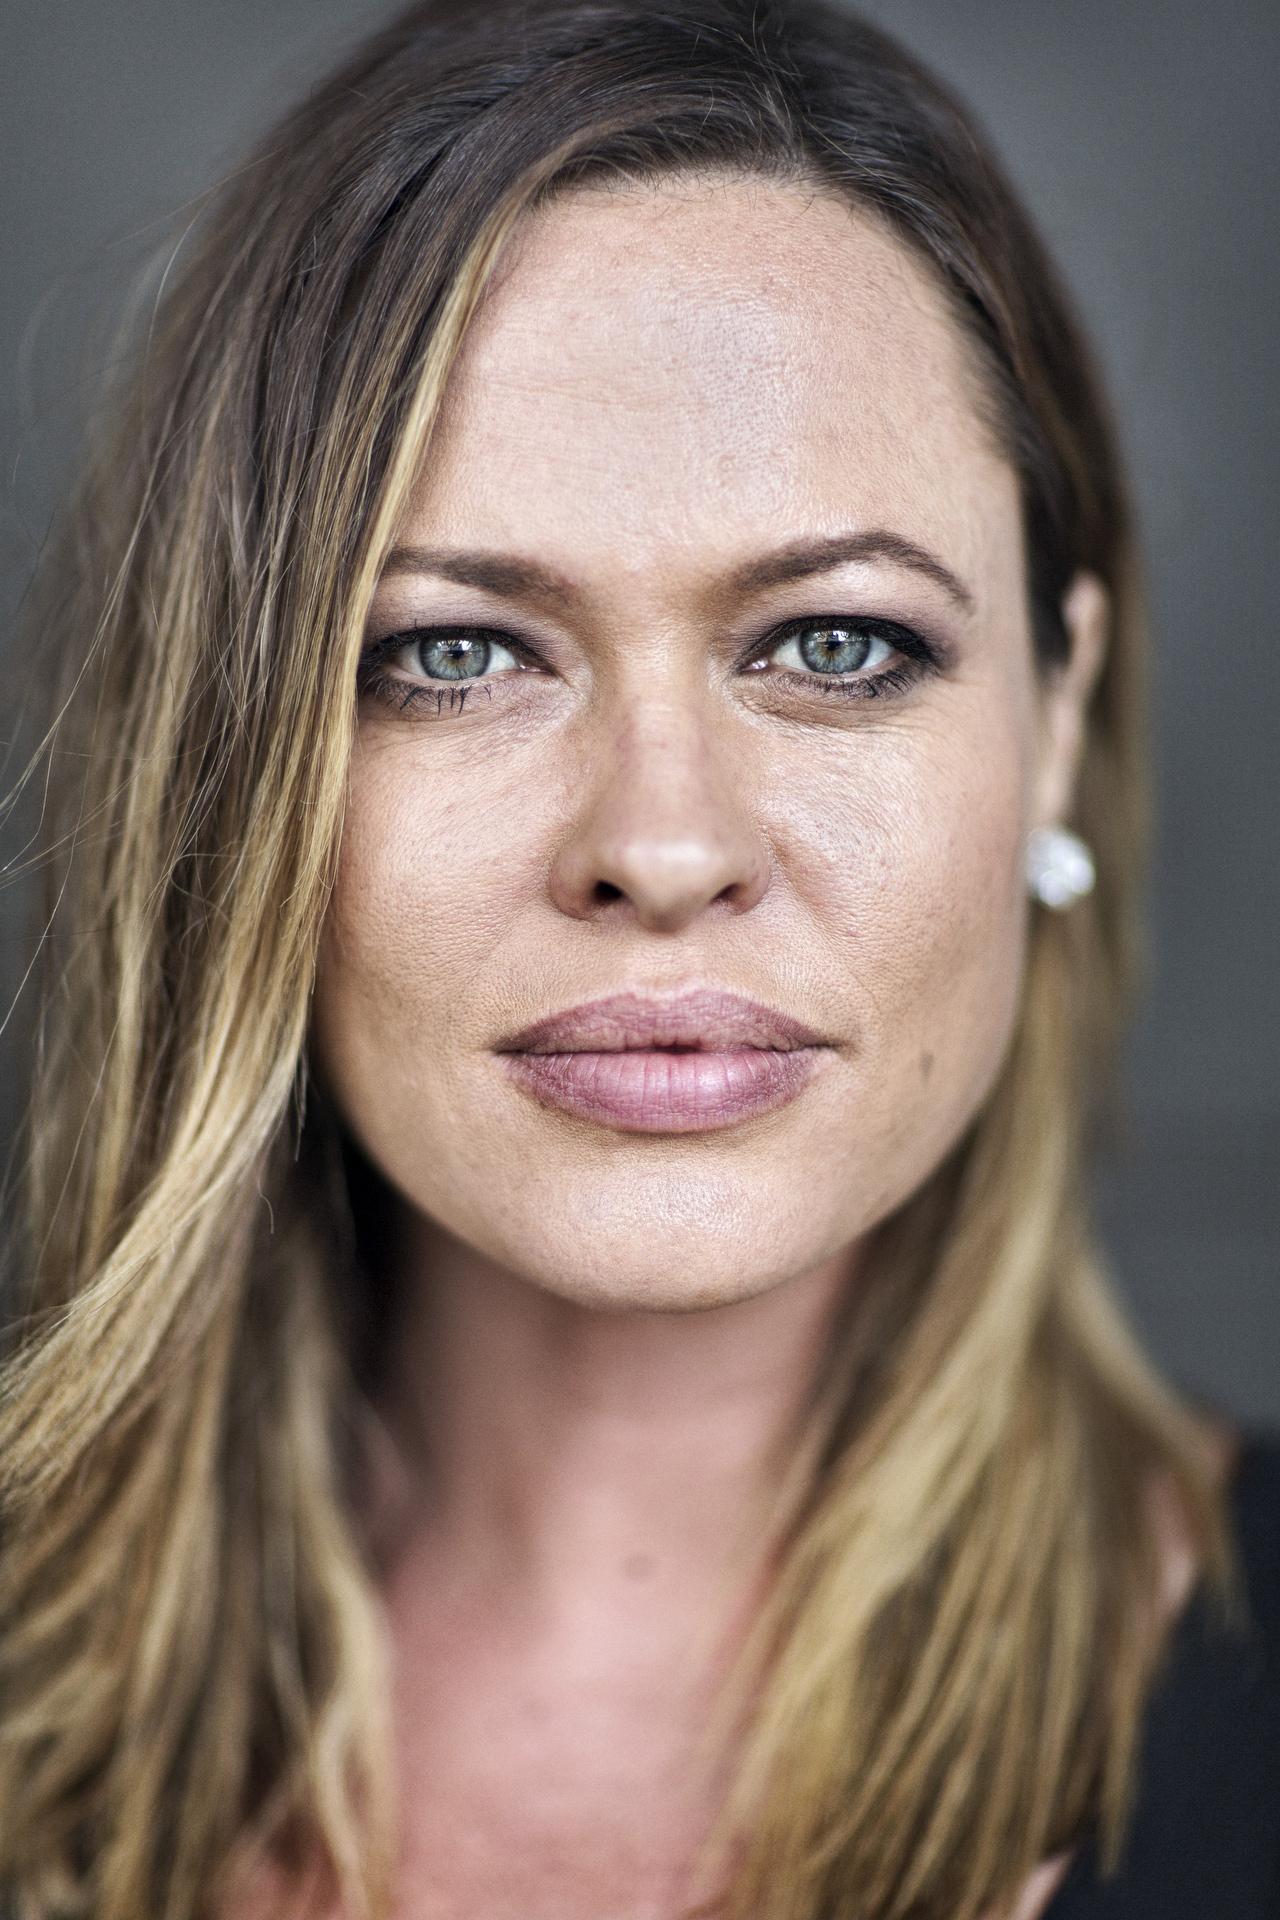 Sydney Portrait Photographer, Personal Branding, Headshots, Corporate Photography, Portraits, Angela Cox, Tv, Presenter, Journalist